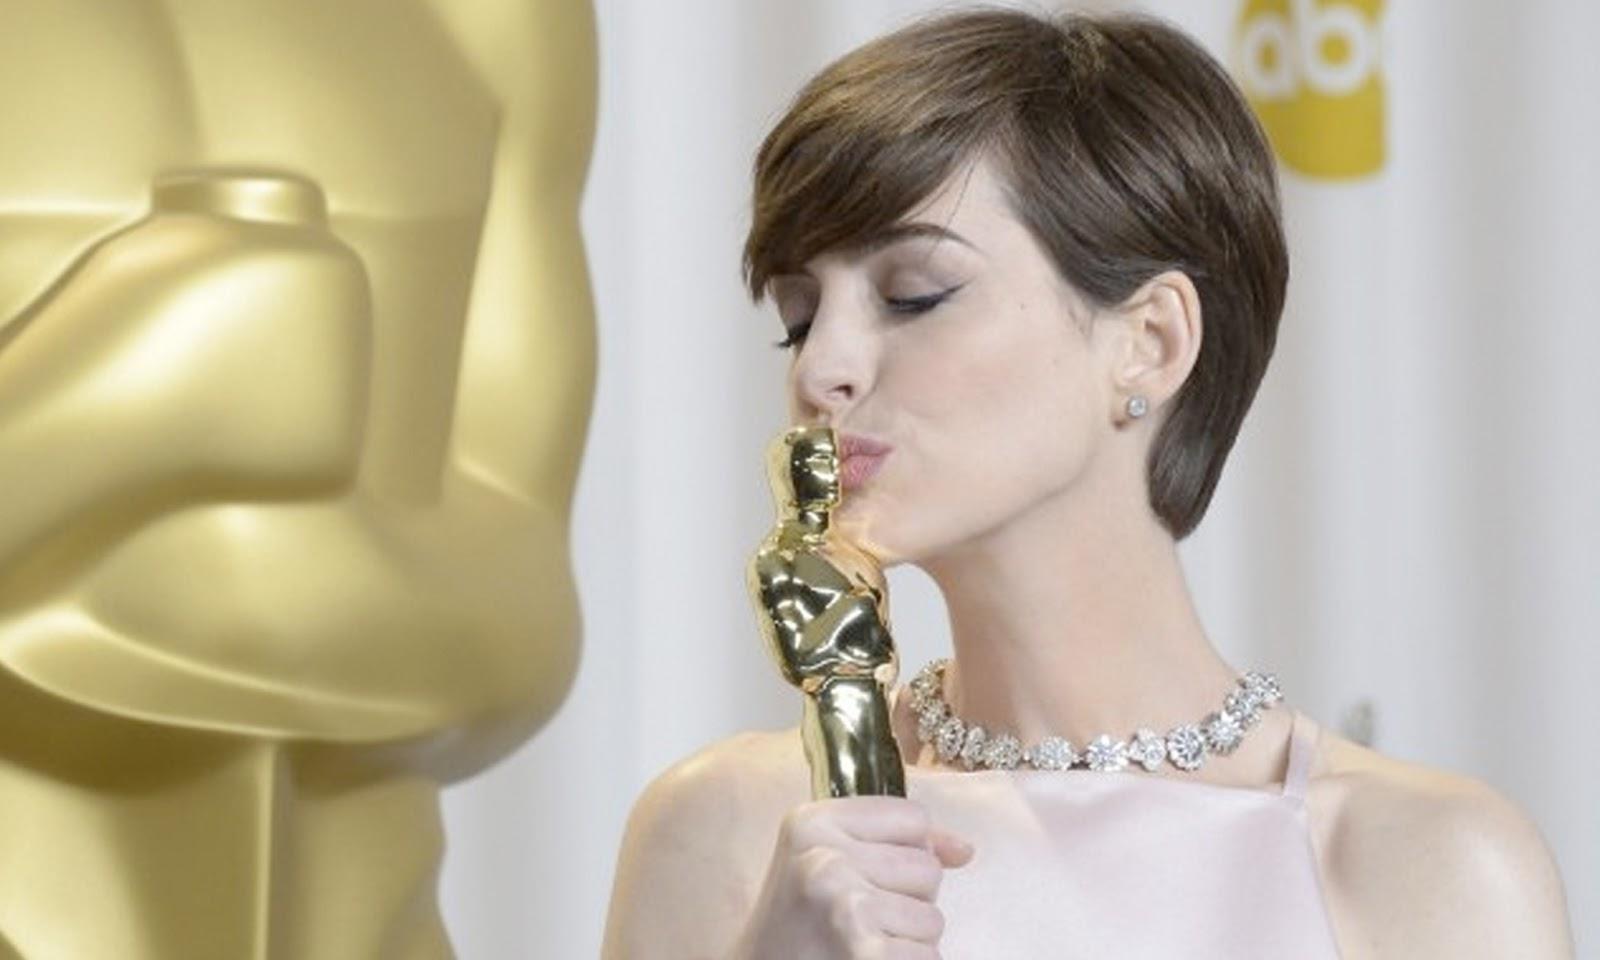 http://3.bp.blogspot.com/-VBmbjLZp22s/USvjx4nB_aI/AAAAAAAARNc/sj1xxbadq7U/s1600/Oscar+2013+-+Anne+Hathaway+(melhor+atriz+coadjuvante).jpg